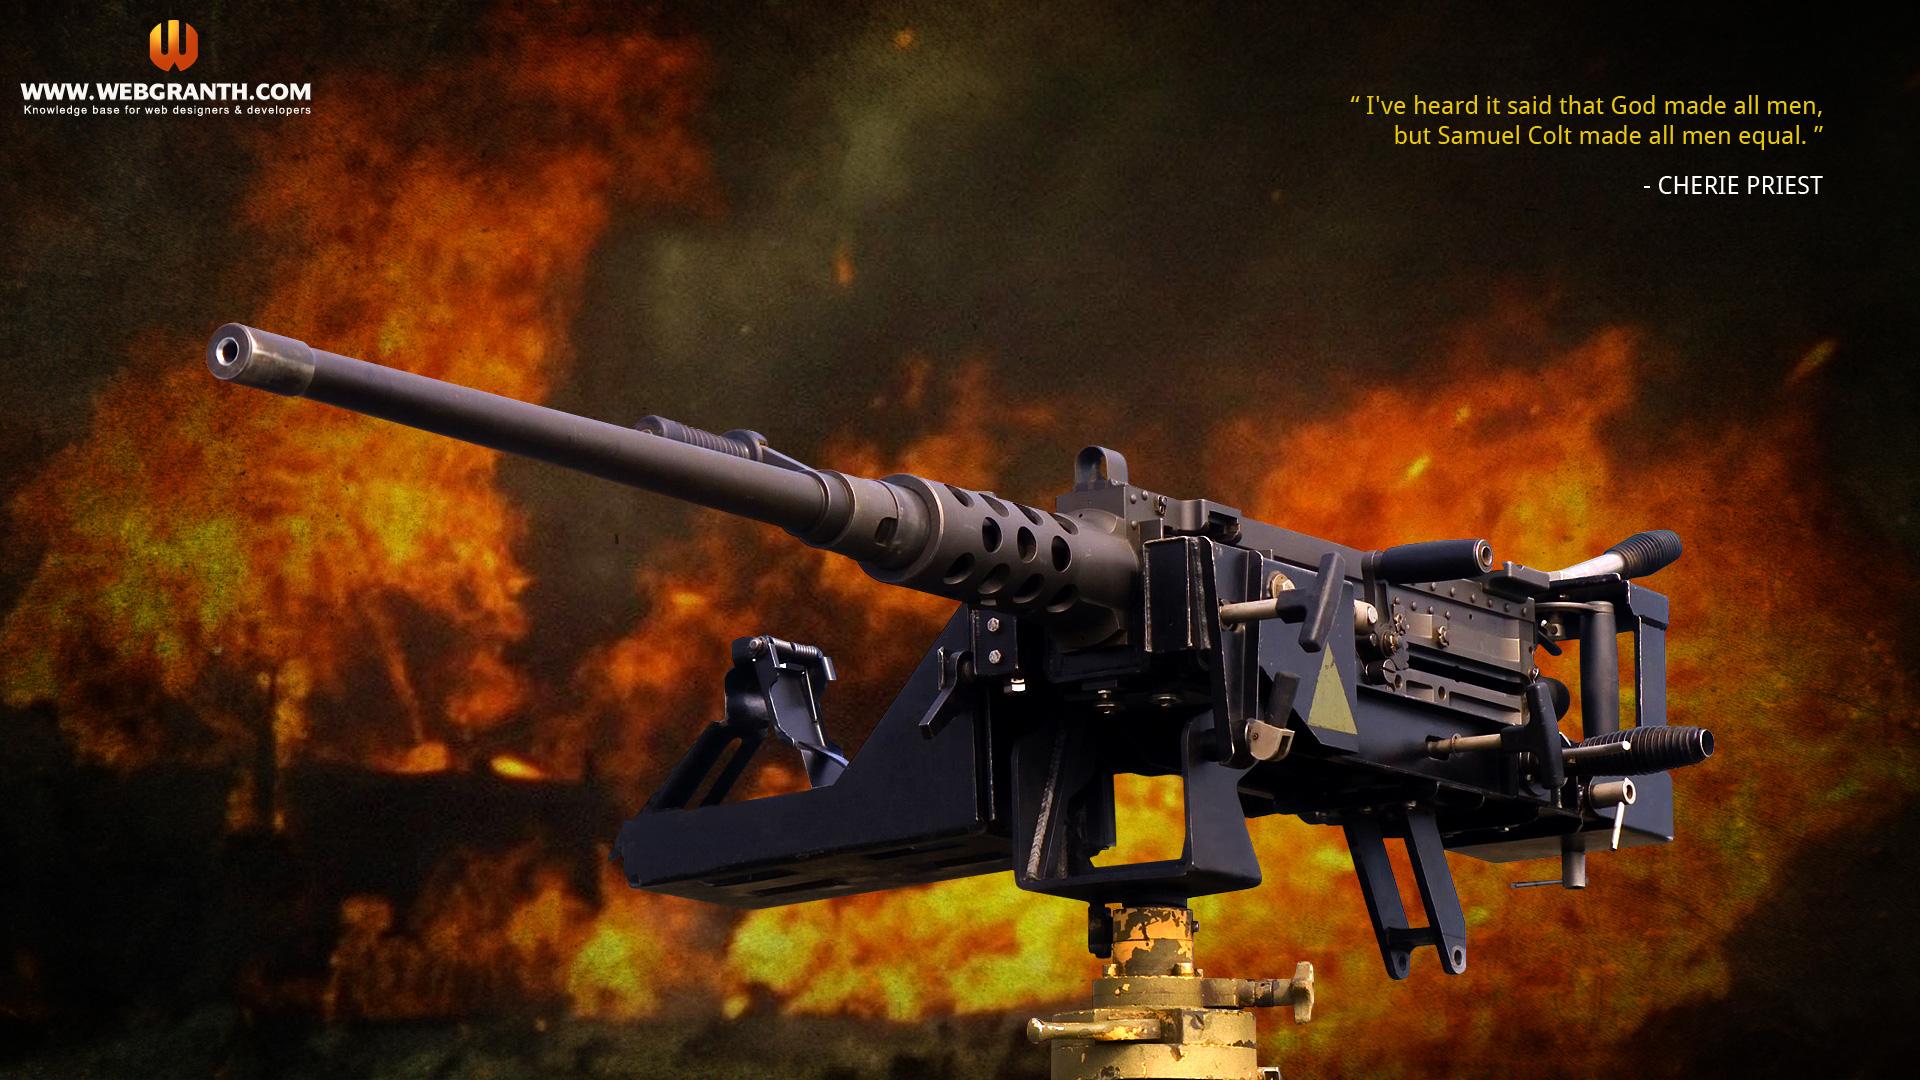 Guns Wallpaper Download HD Guns Weapons Wallpapers   Webgranth 2015 1920x1080